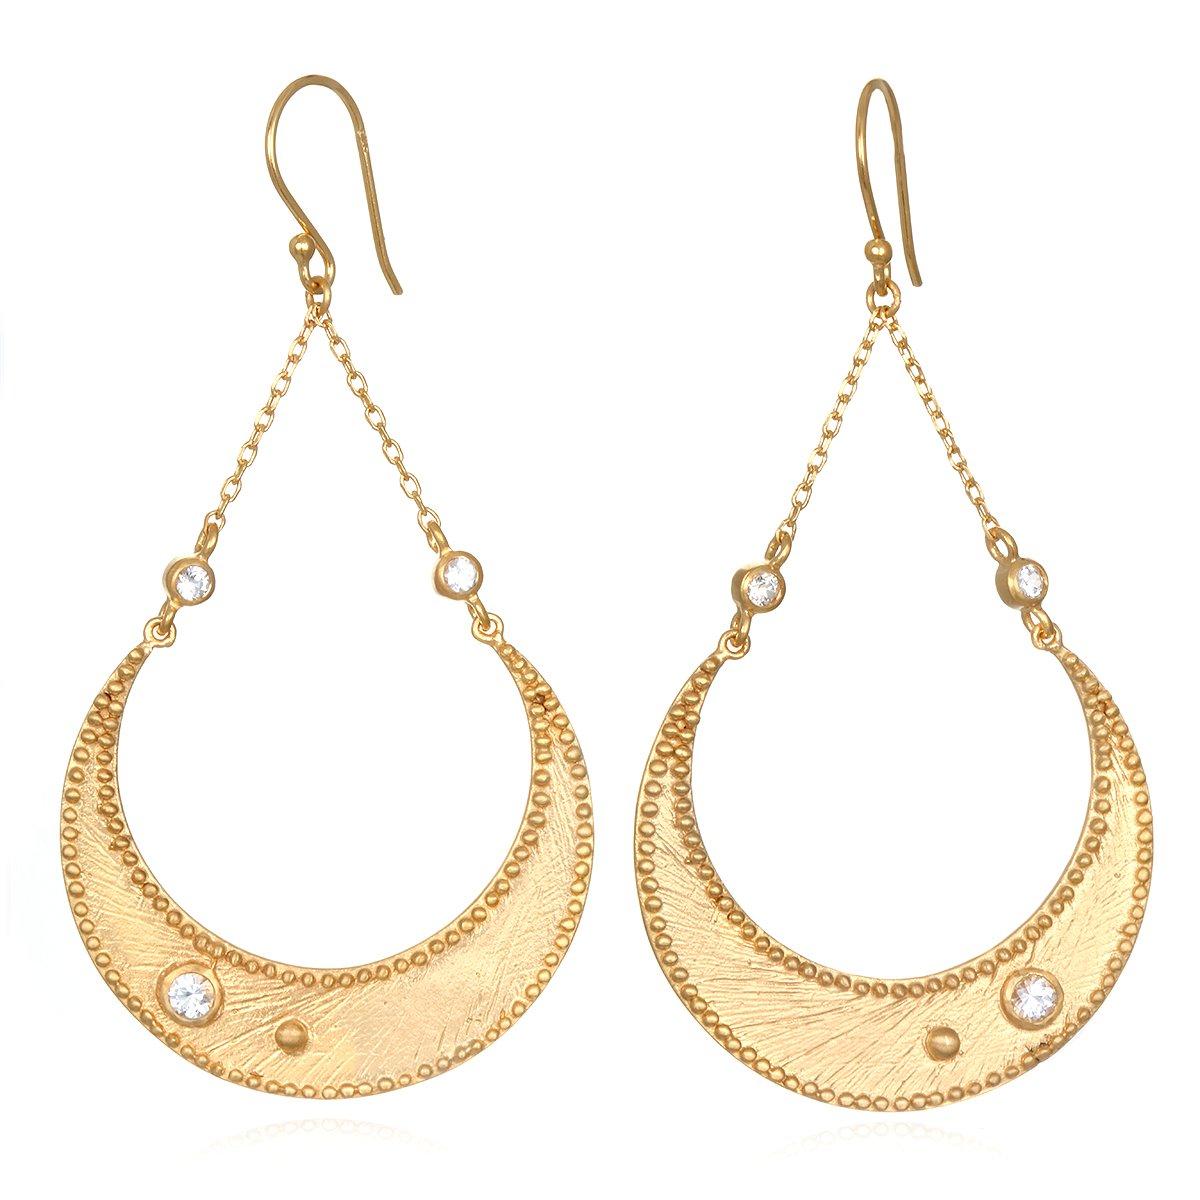 Enchanting Moonbeams Earrings, $149 @satyajewelry.com